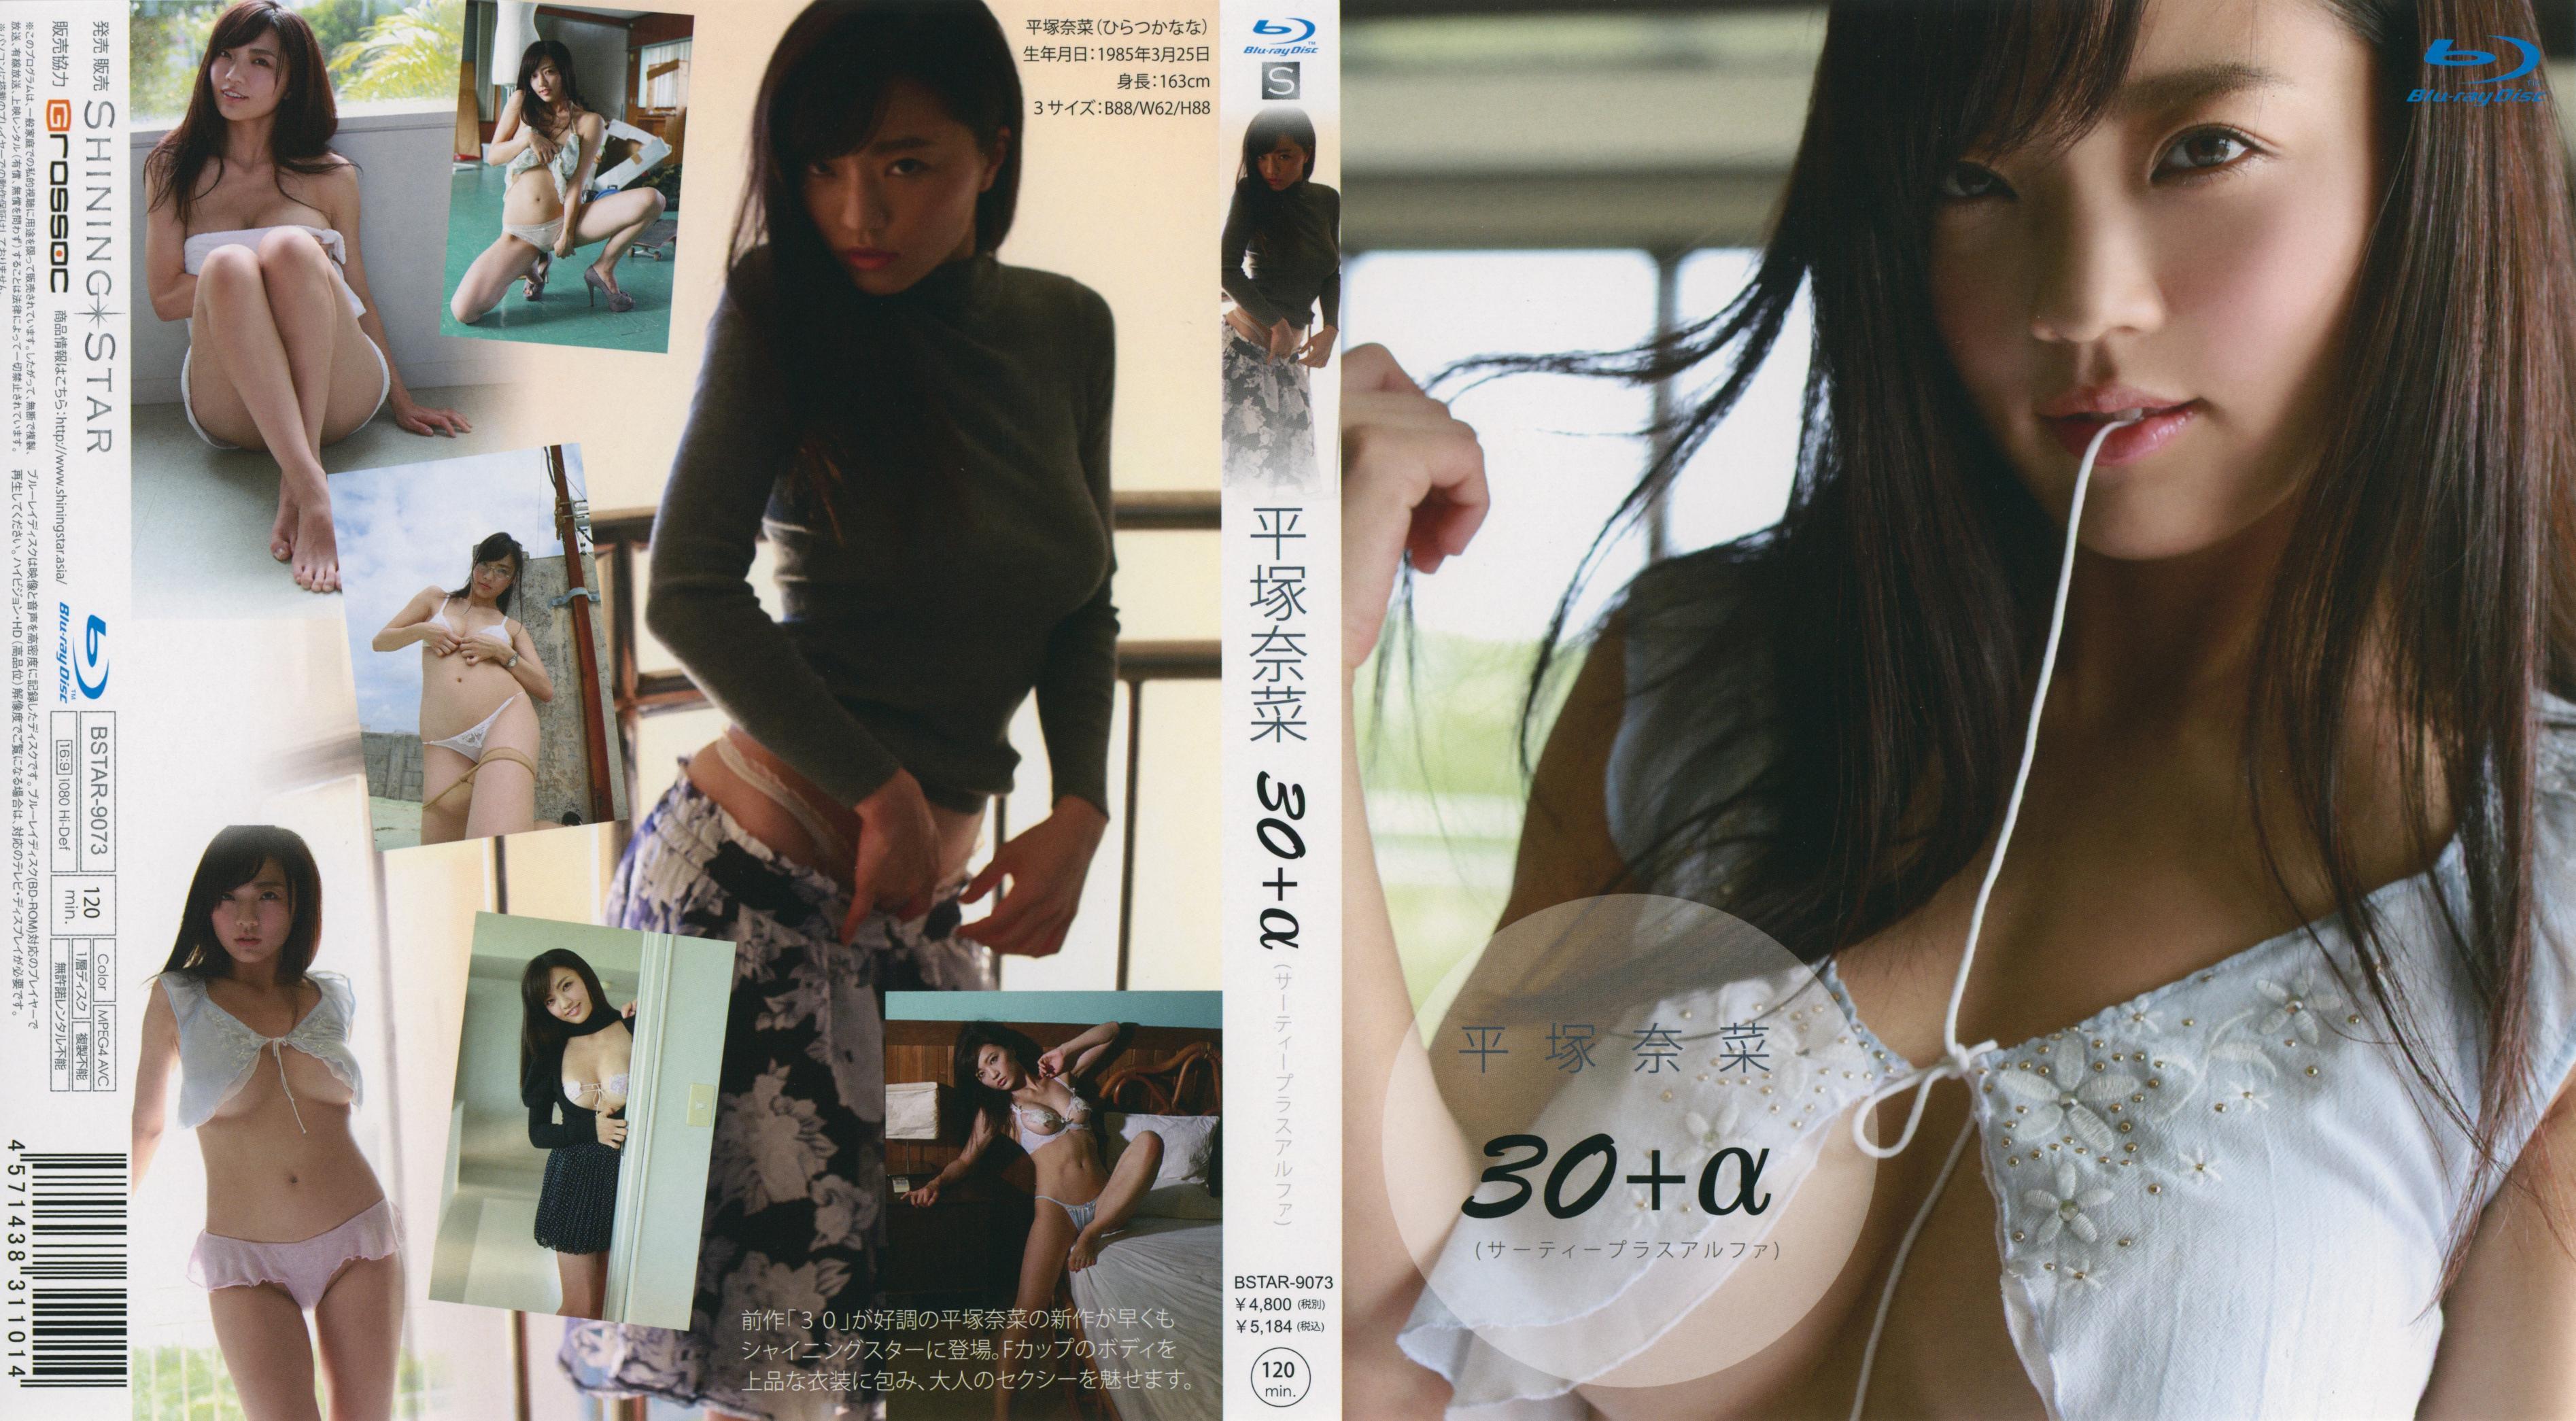 [BSTAR-9073] Nana Hiratsuka 平塚奈菜 – 30+α Blu-ray